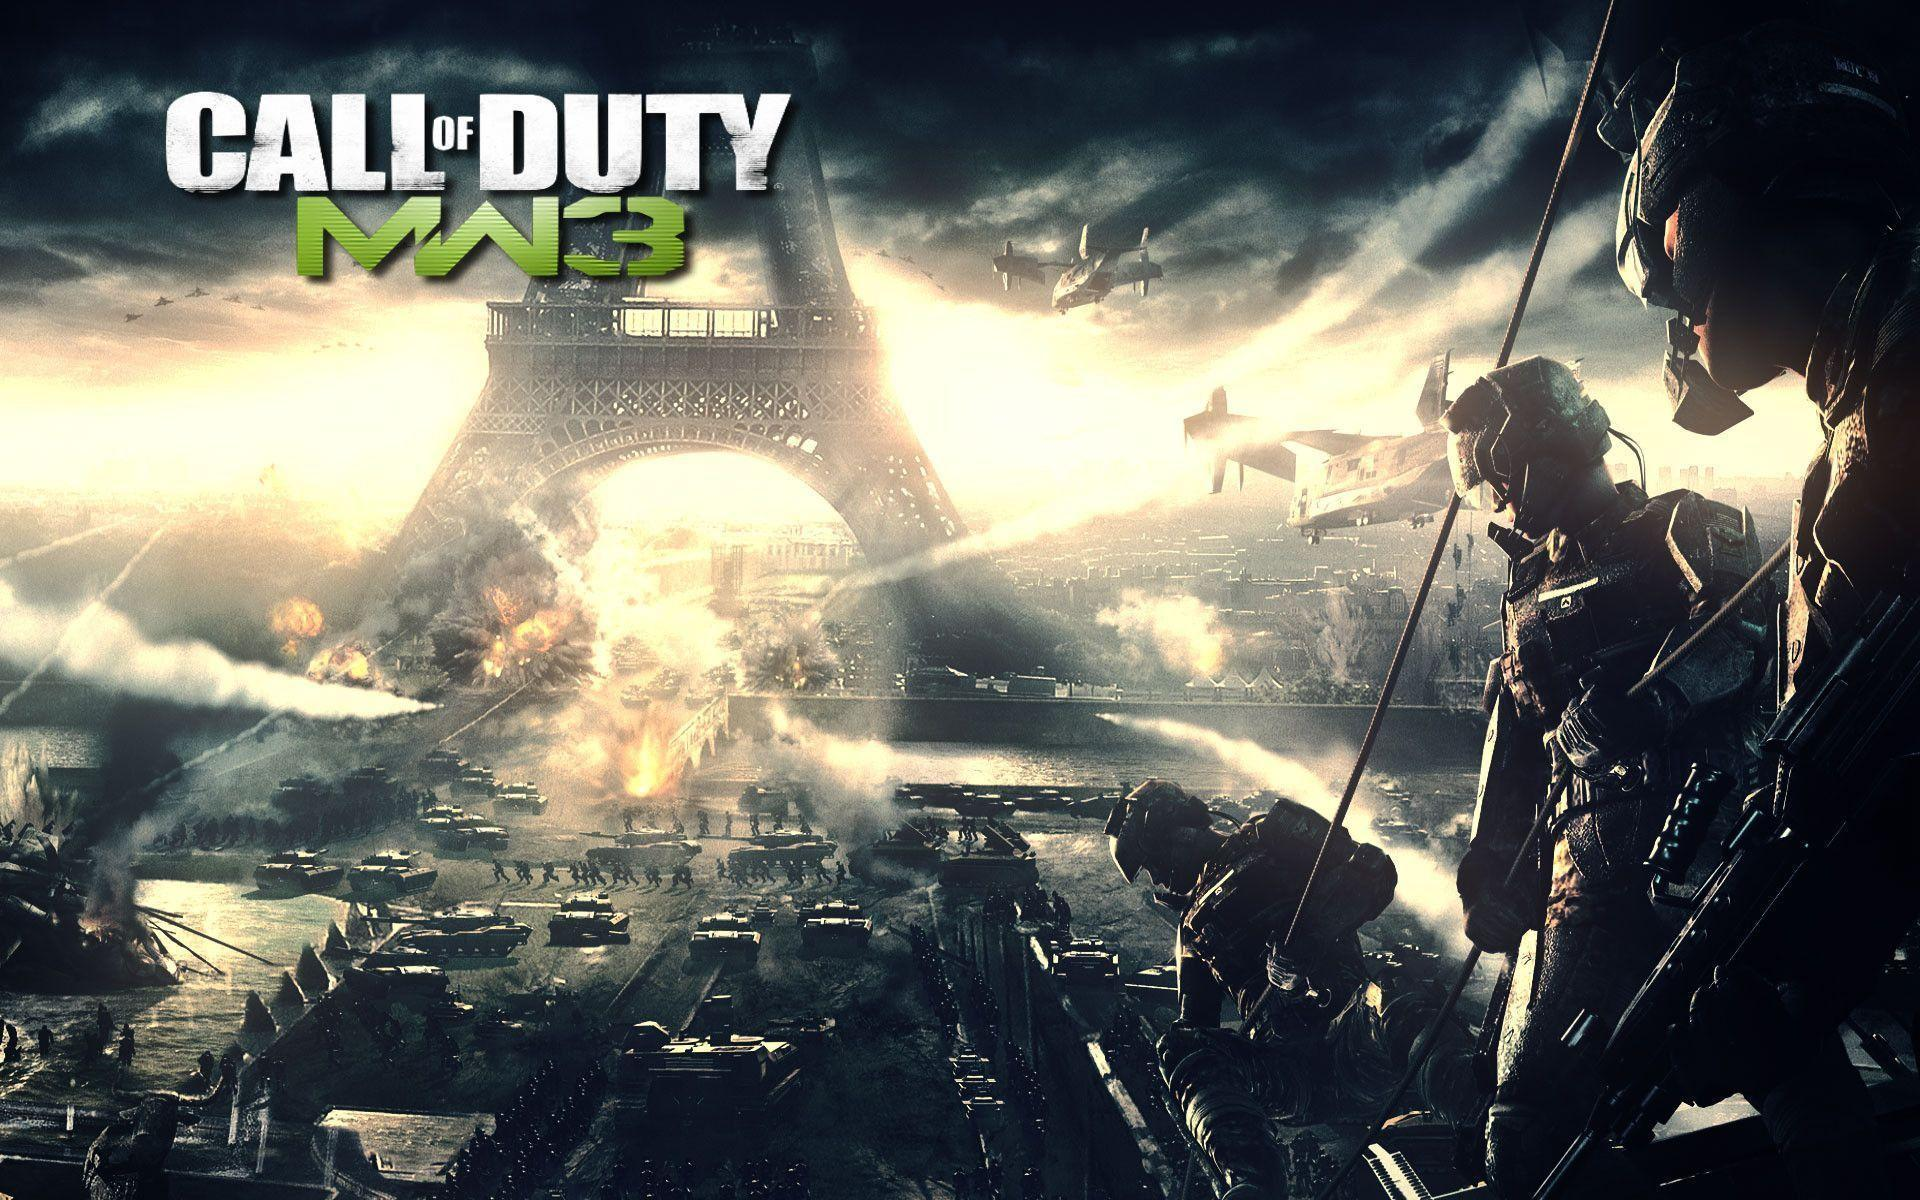 Call Of Duty Modern Warfare 3 Wallpapers - Full HD wallpaper search